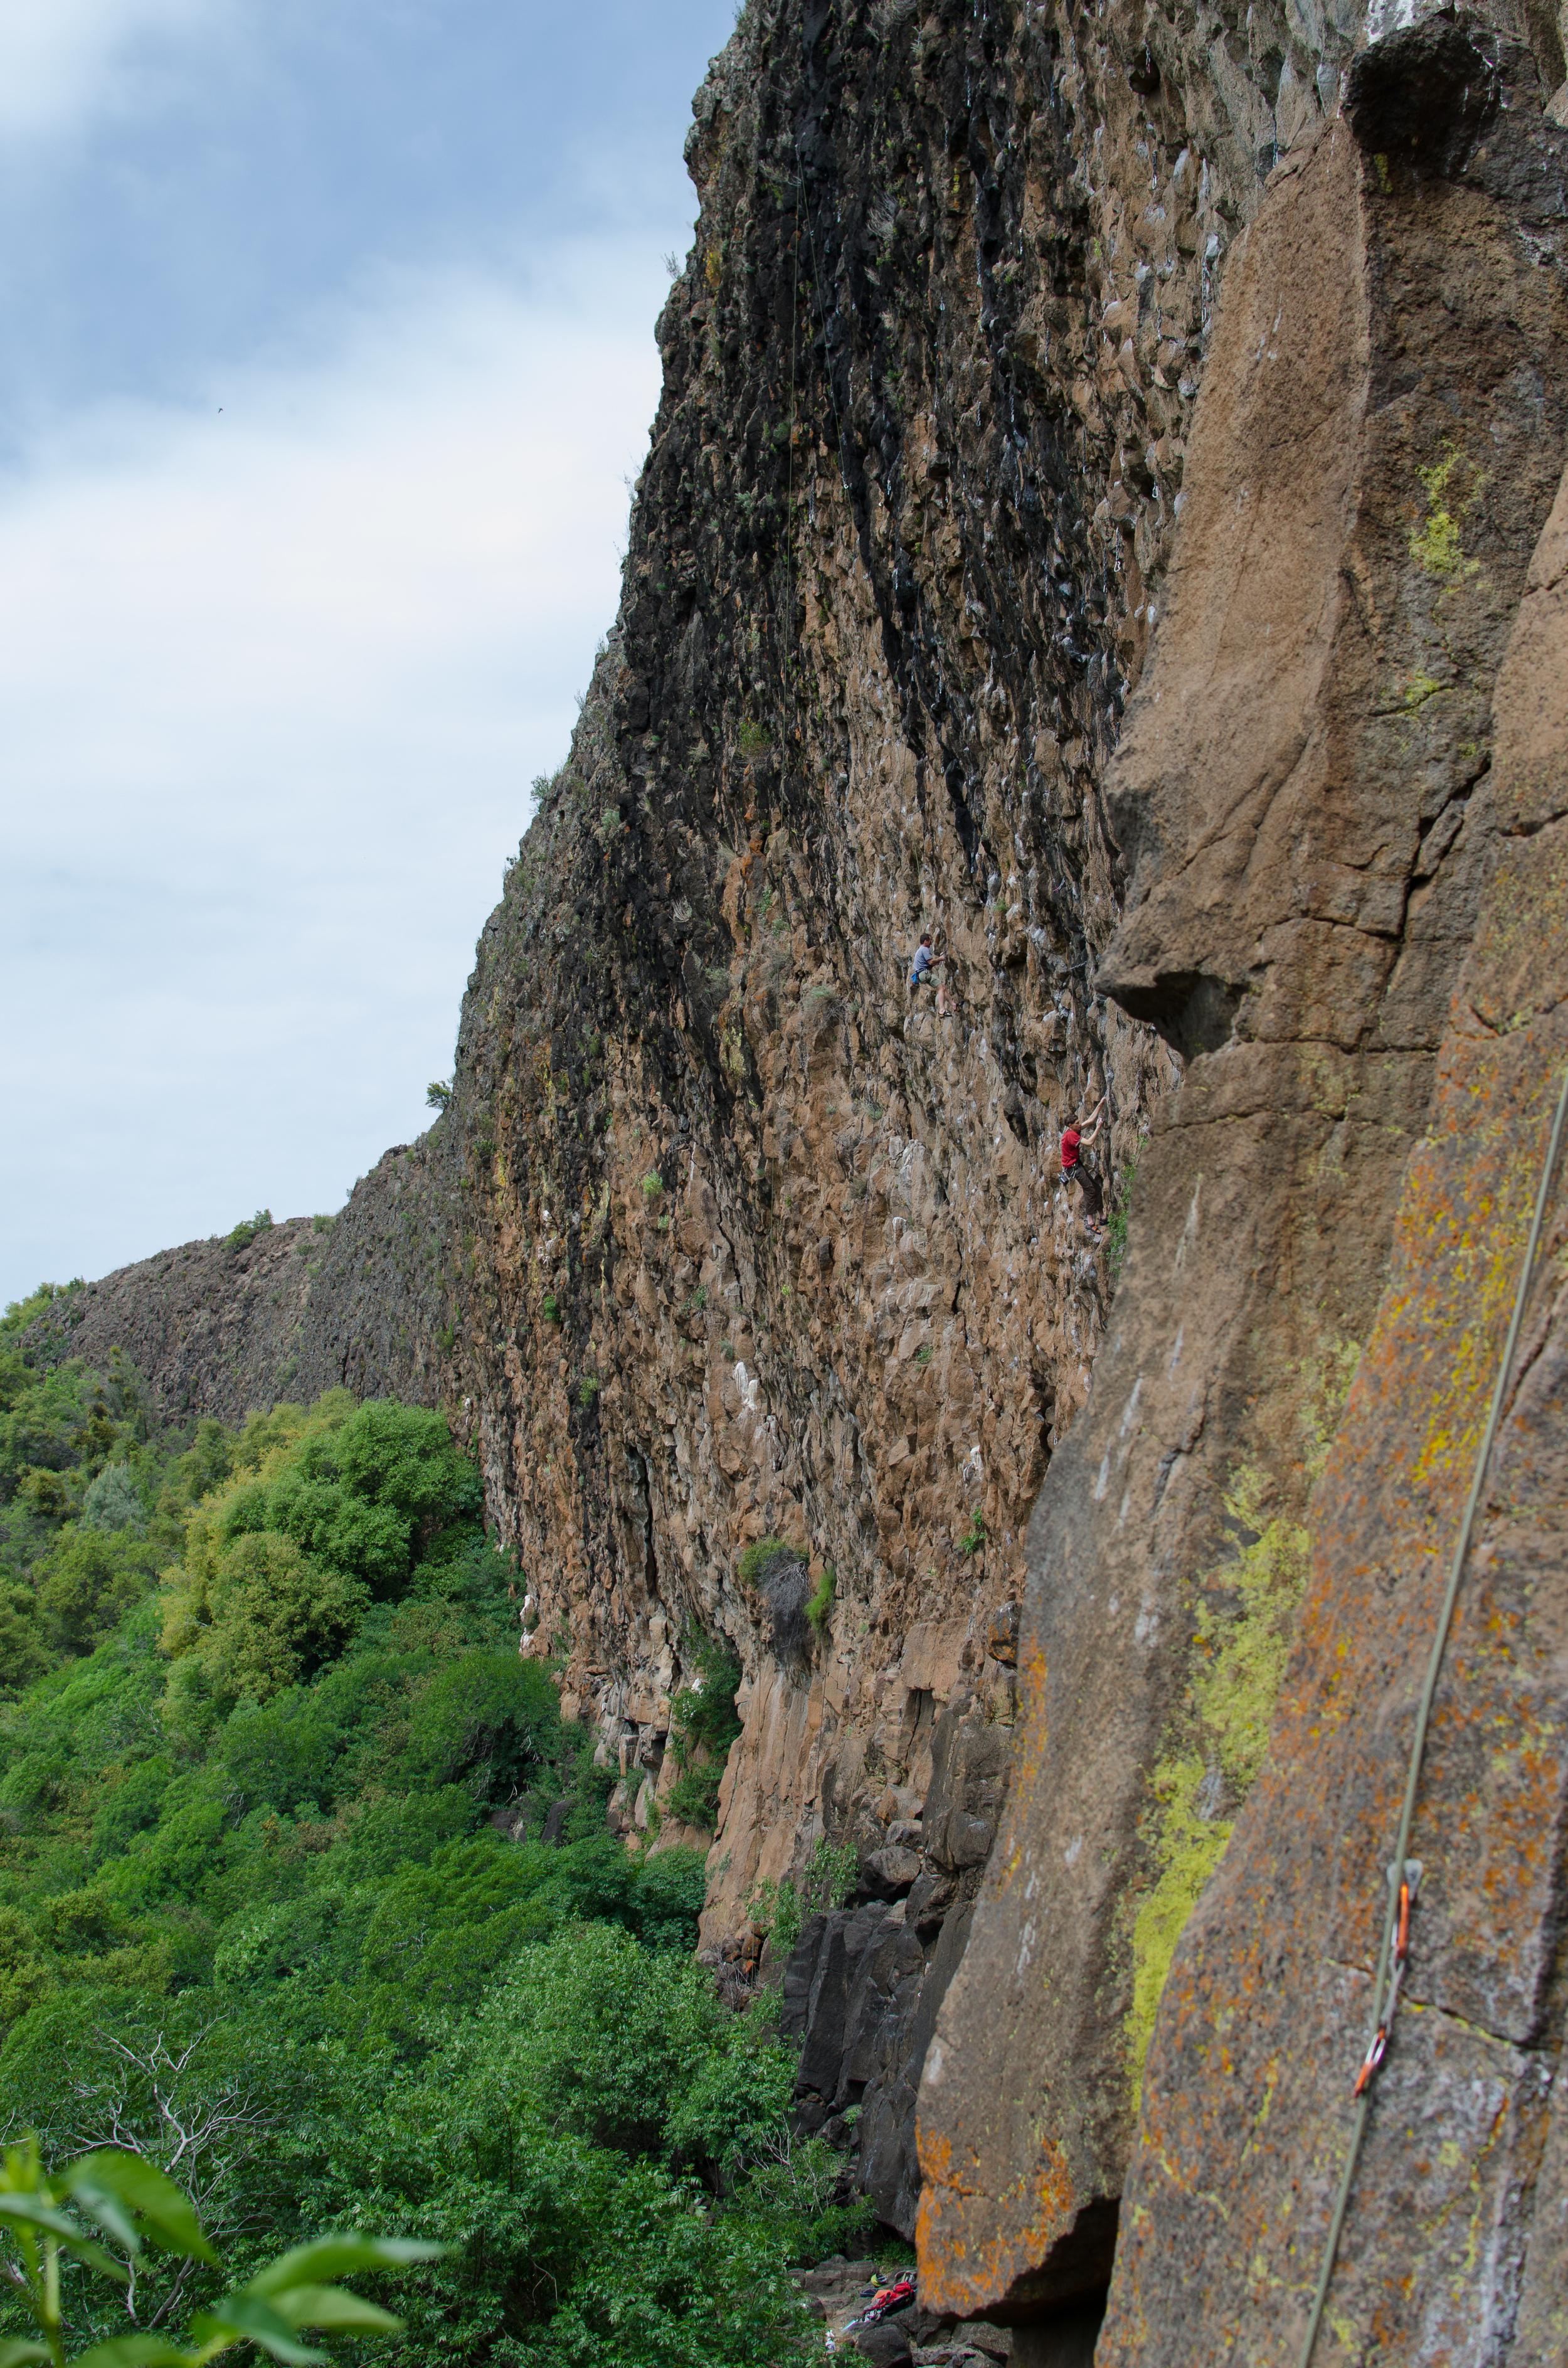 Beautiful overhanging sport climbing